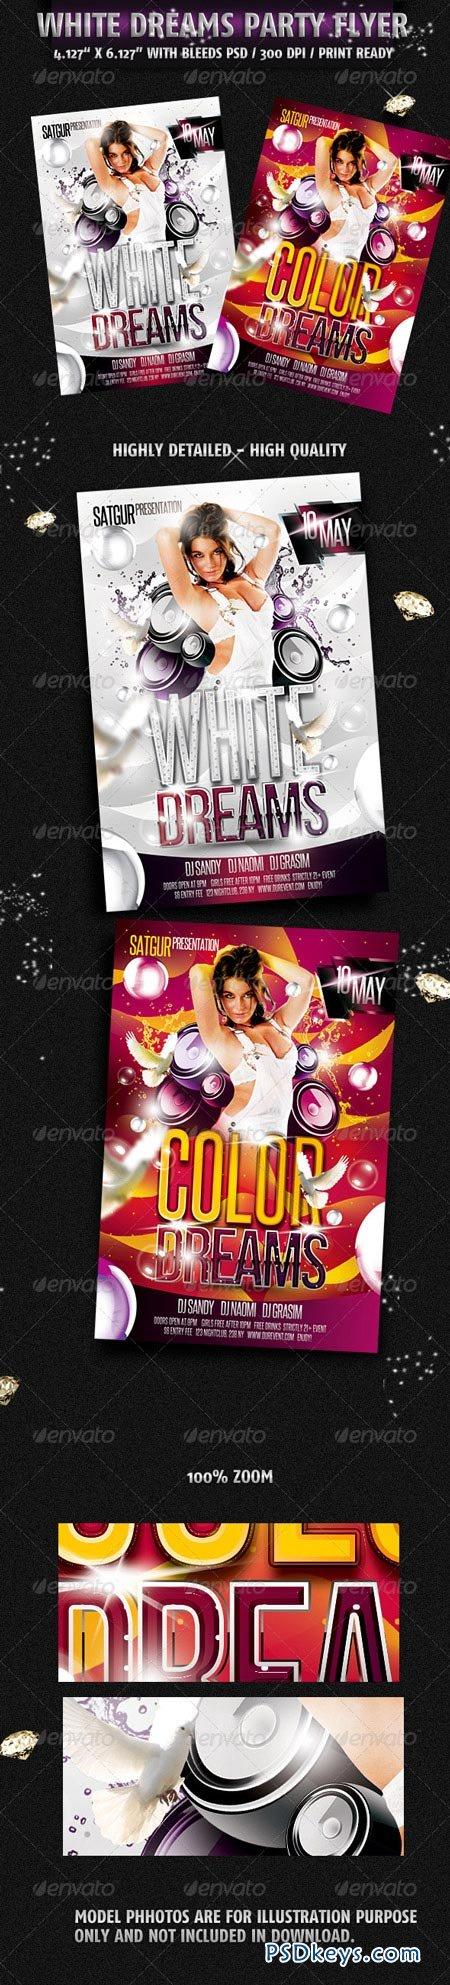 White Dreams Party Flyer 2274621